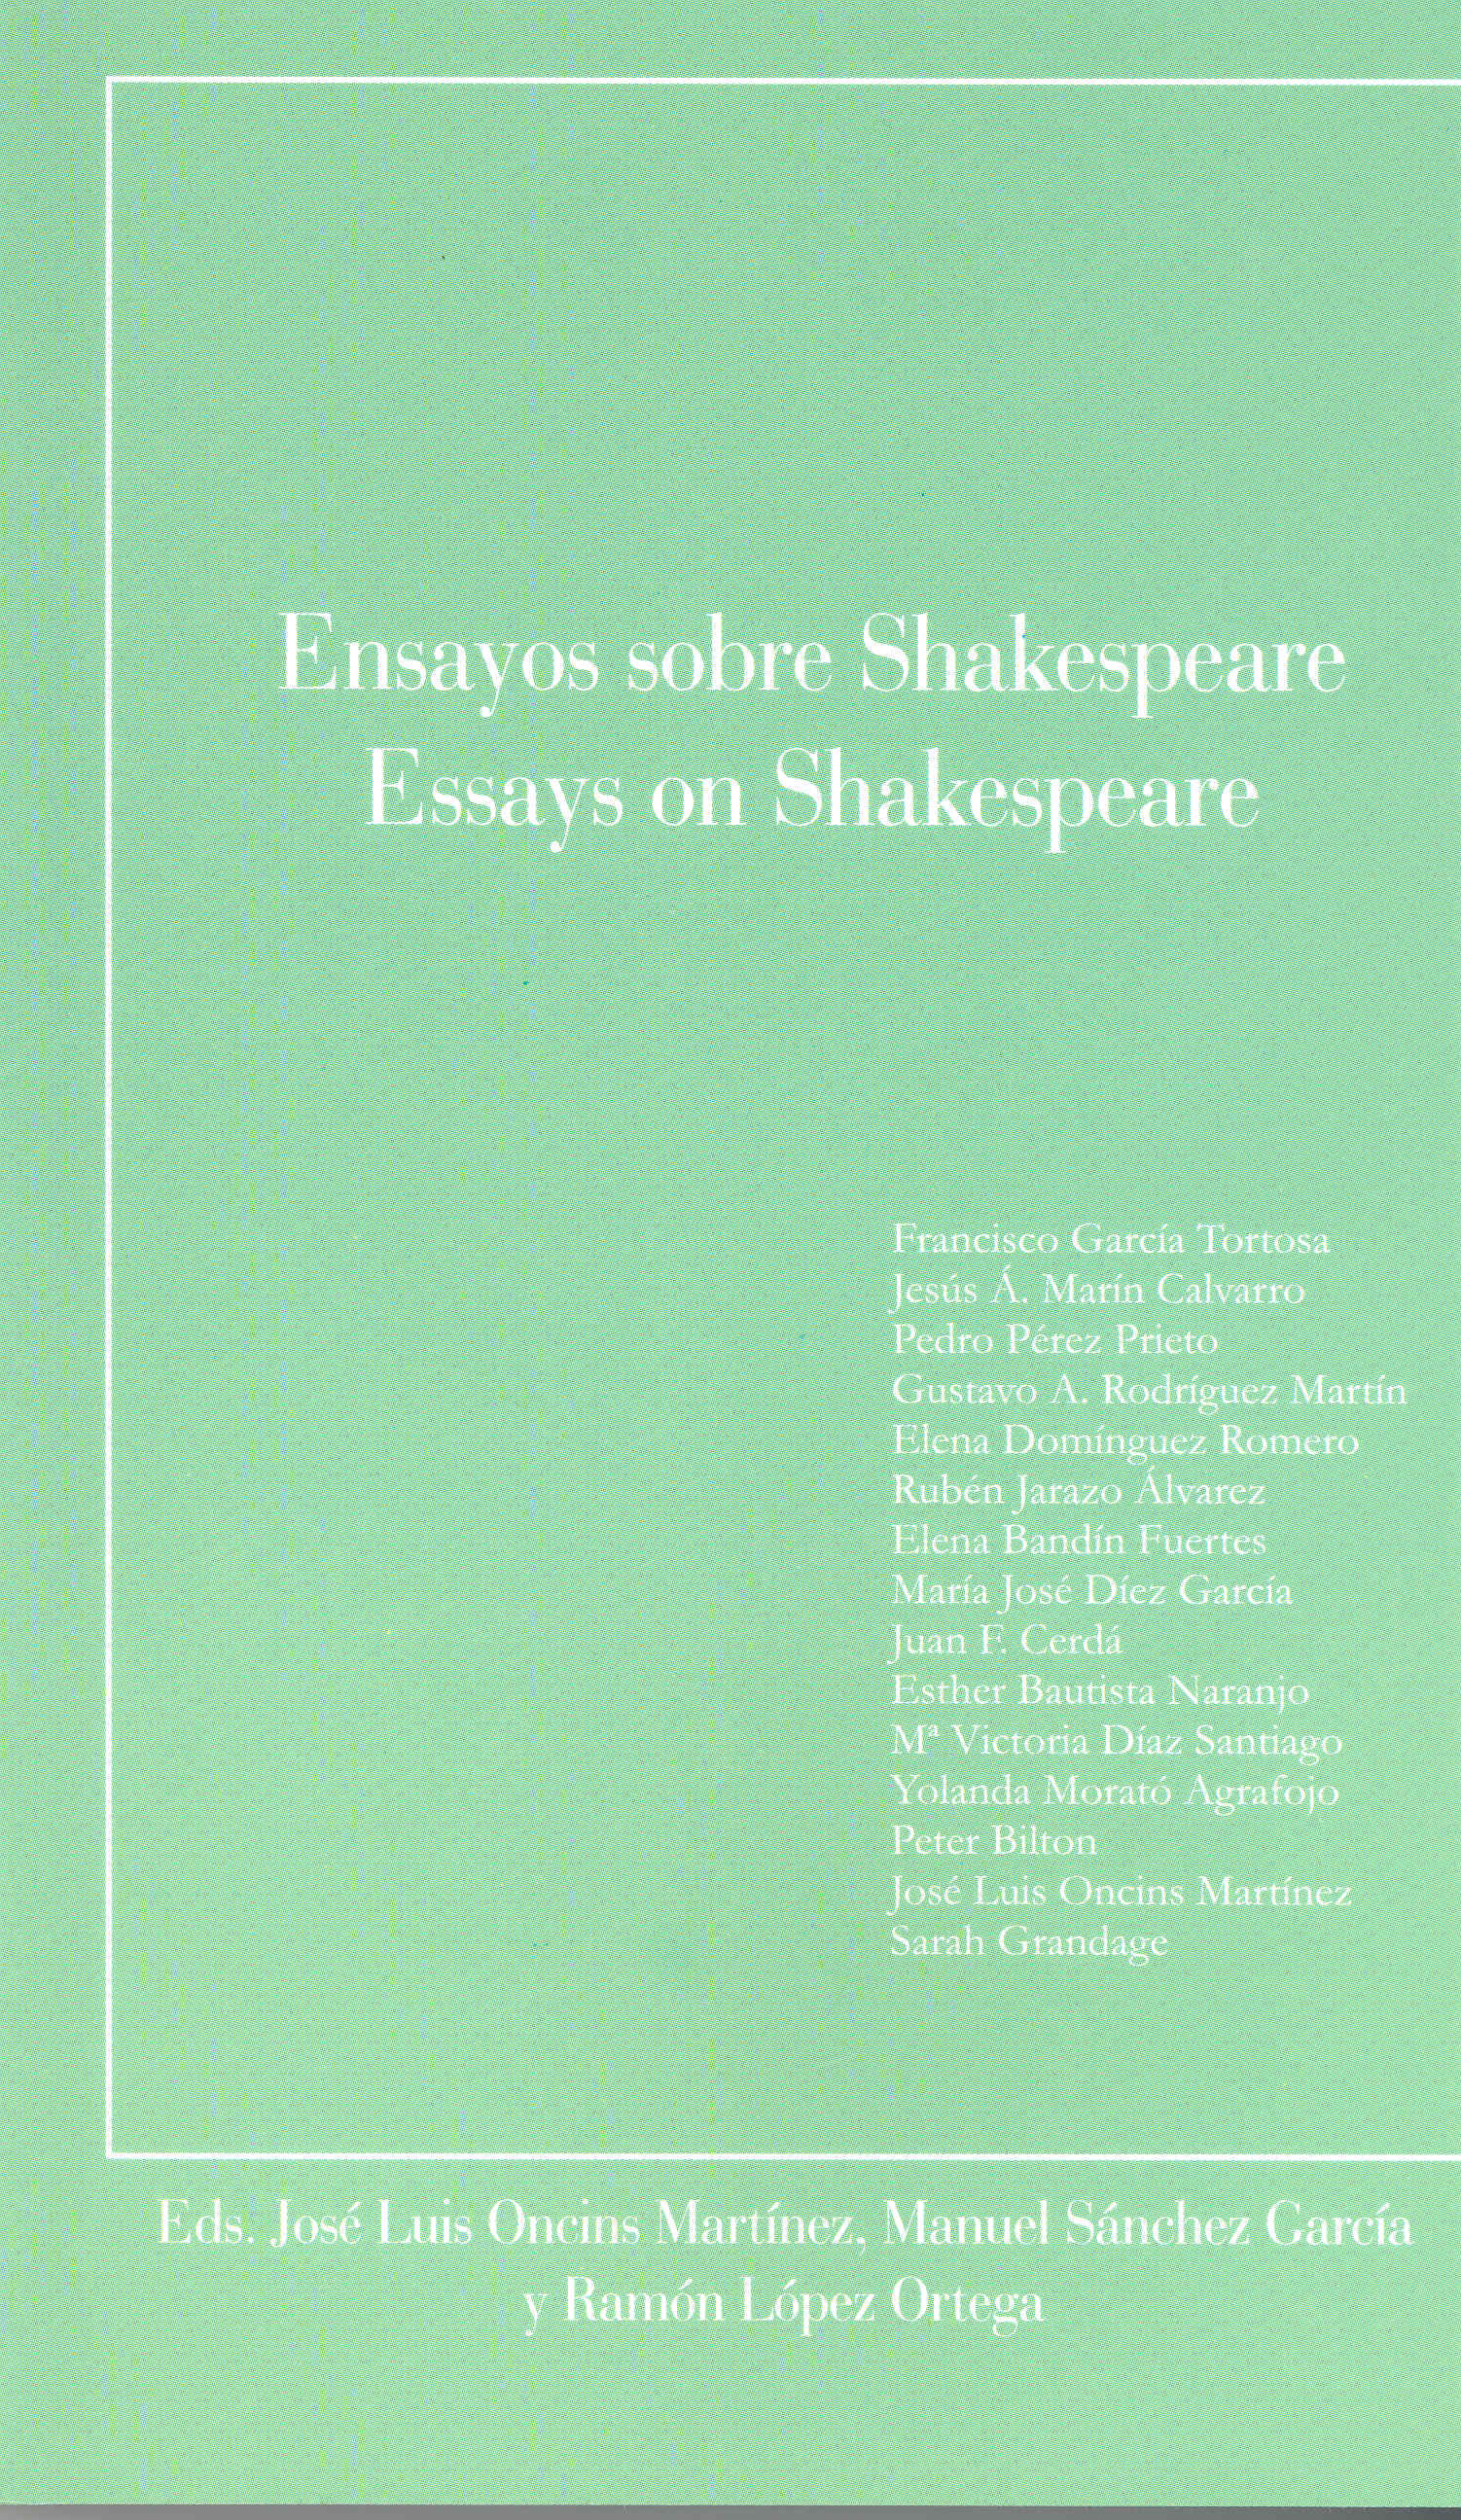 ensayos sobre shakespeare essays on shakespeare jose luis ensayos sobre shakespeare essays on shakespeare jose luis oncins martinez 9788477239321